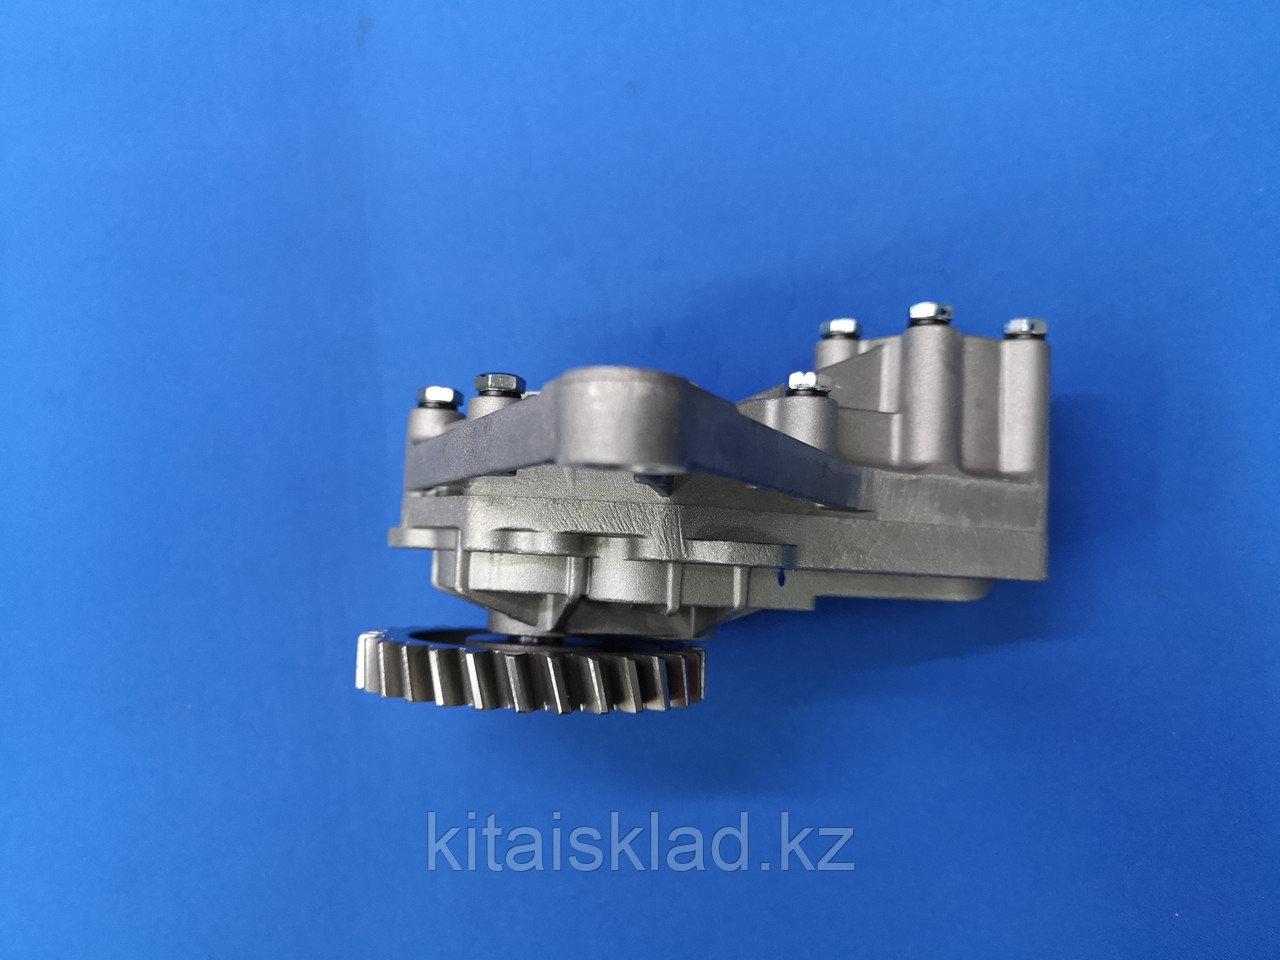 Масляный насос Deutz TD226B-6/WP6G125E22, 12159765/sp105129/sp